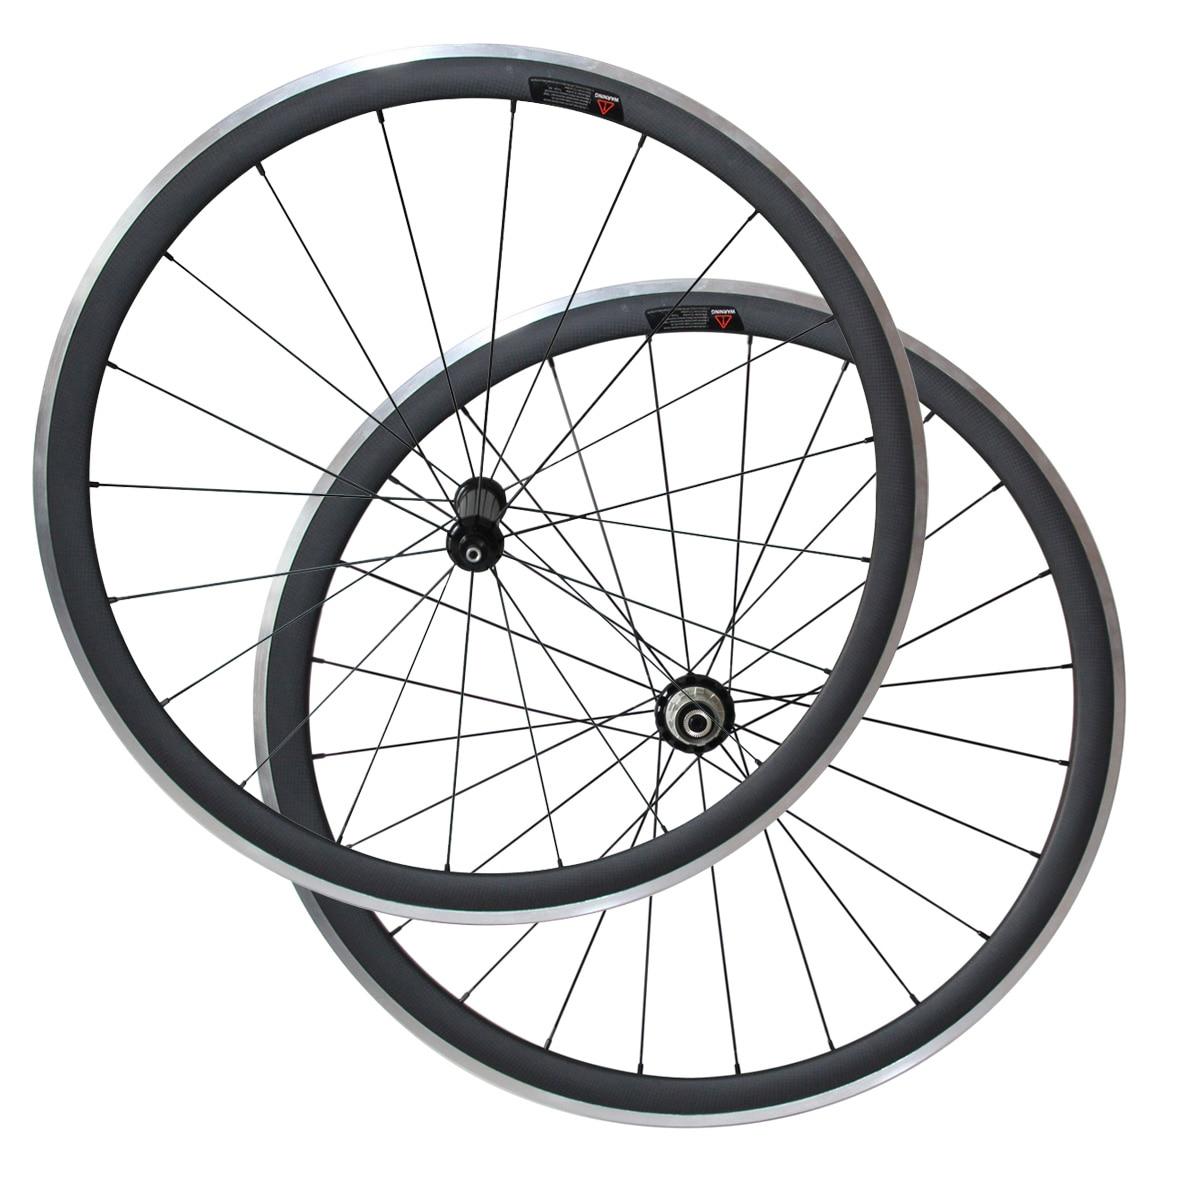 700C Road Bike Carbon Wheels 38mm Deep Clincher 23mm Wide V brake Rims with Aluminium Brake